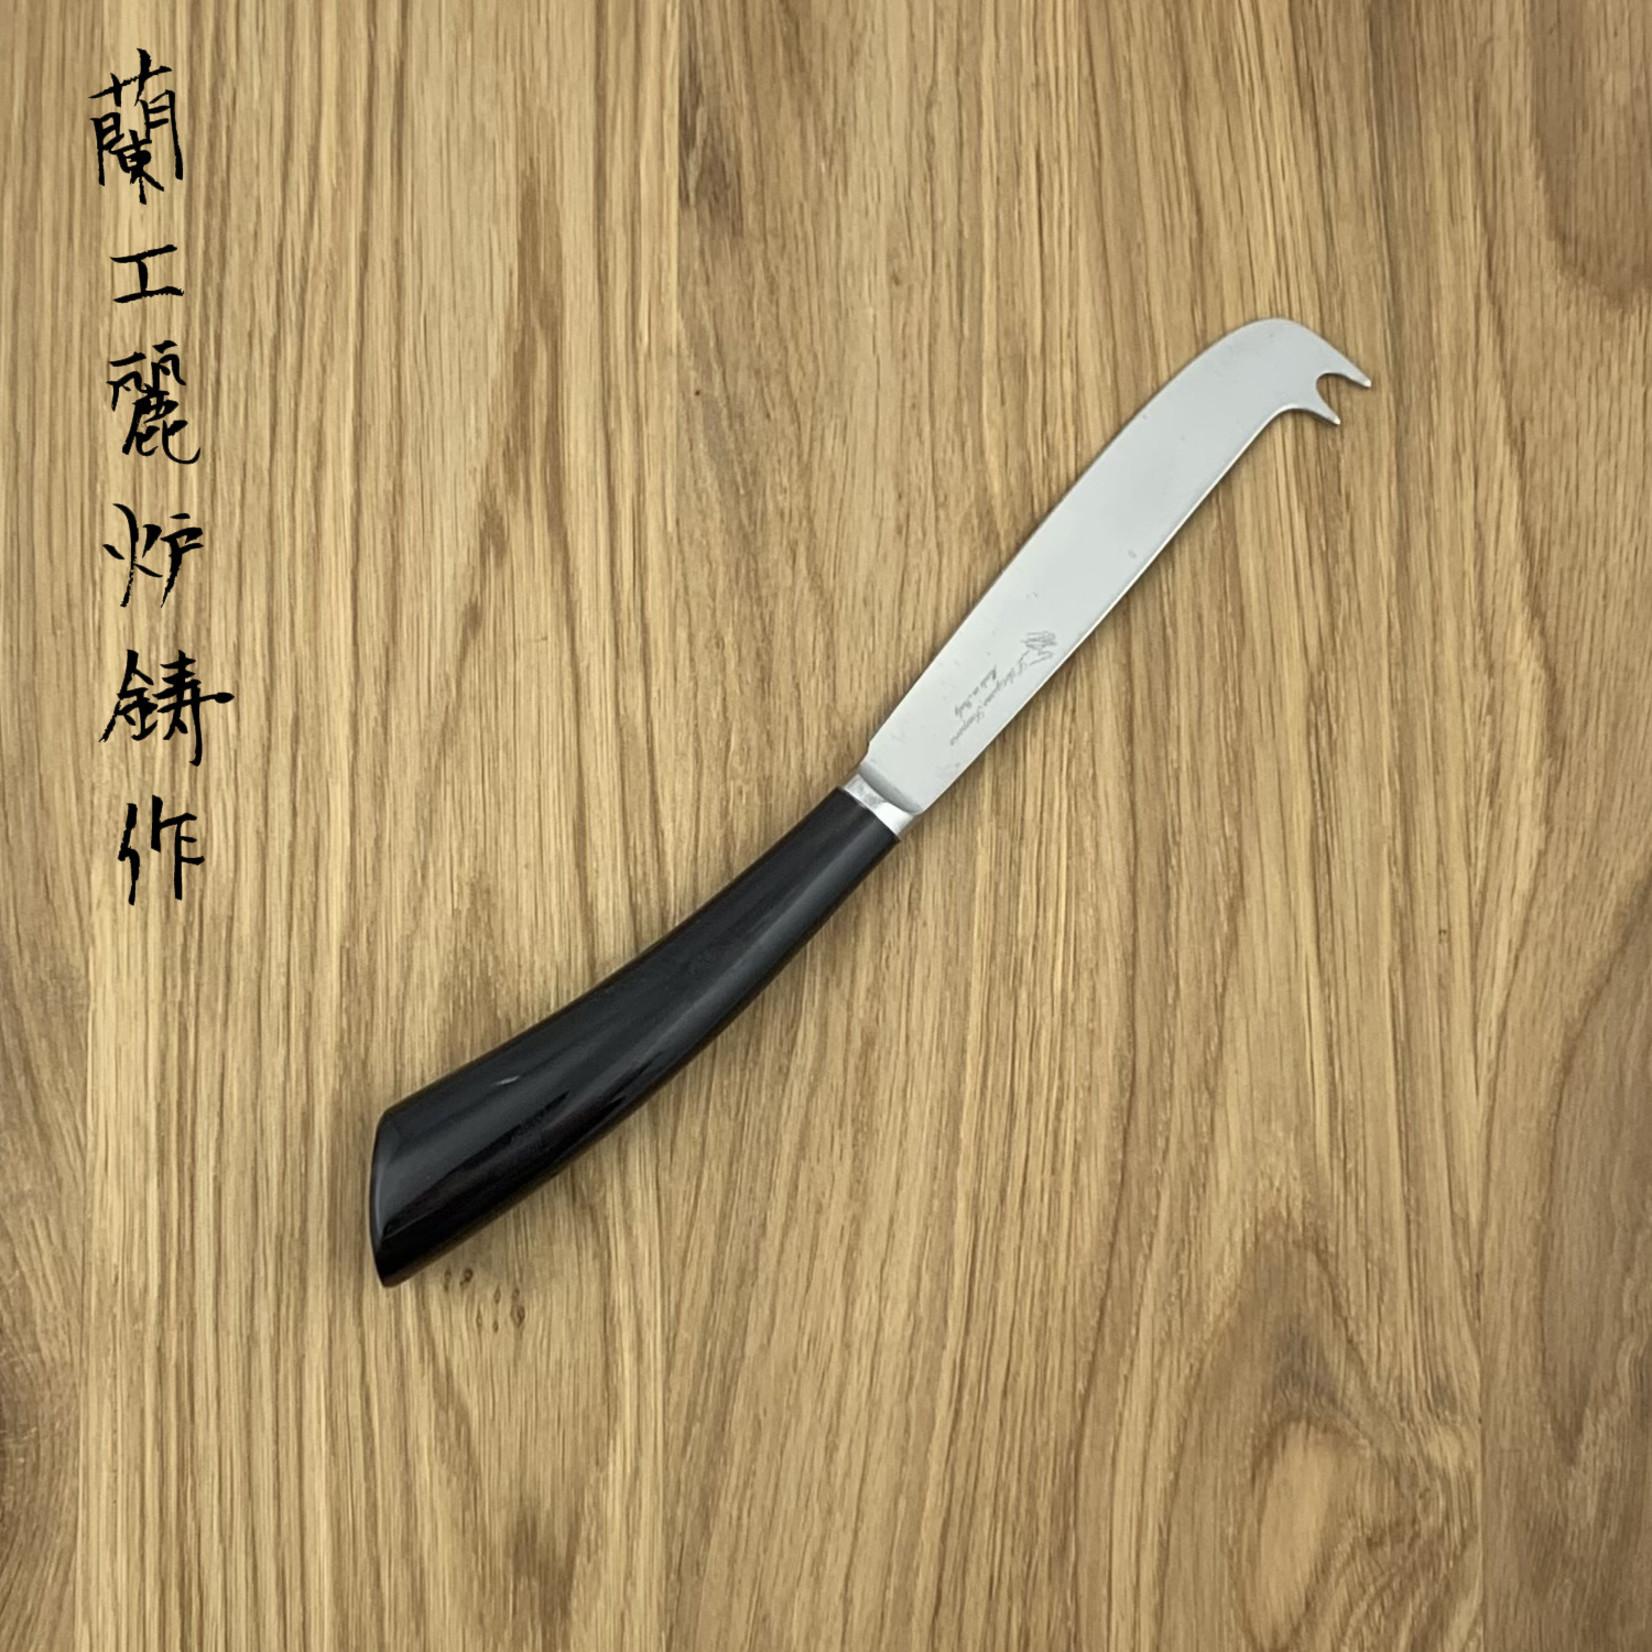 ARTIGIANO cheeseknife straight horn